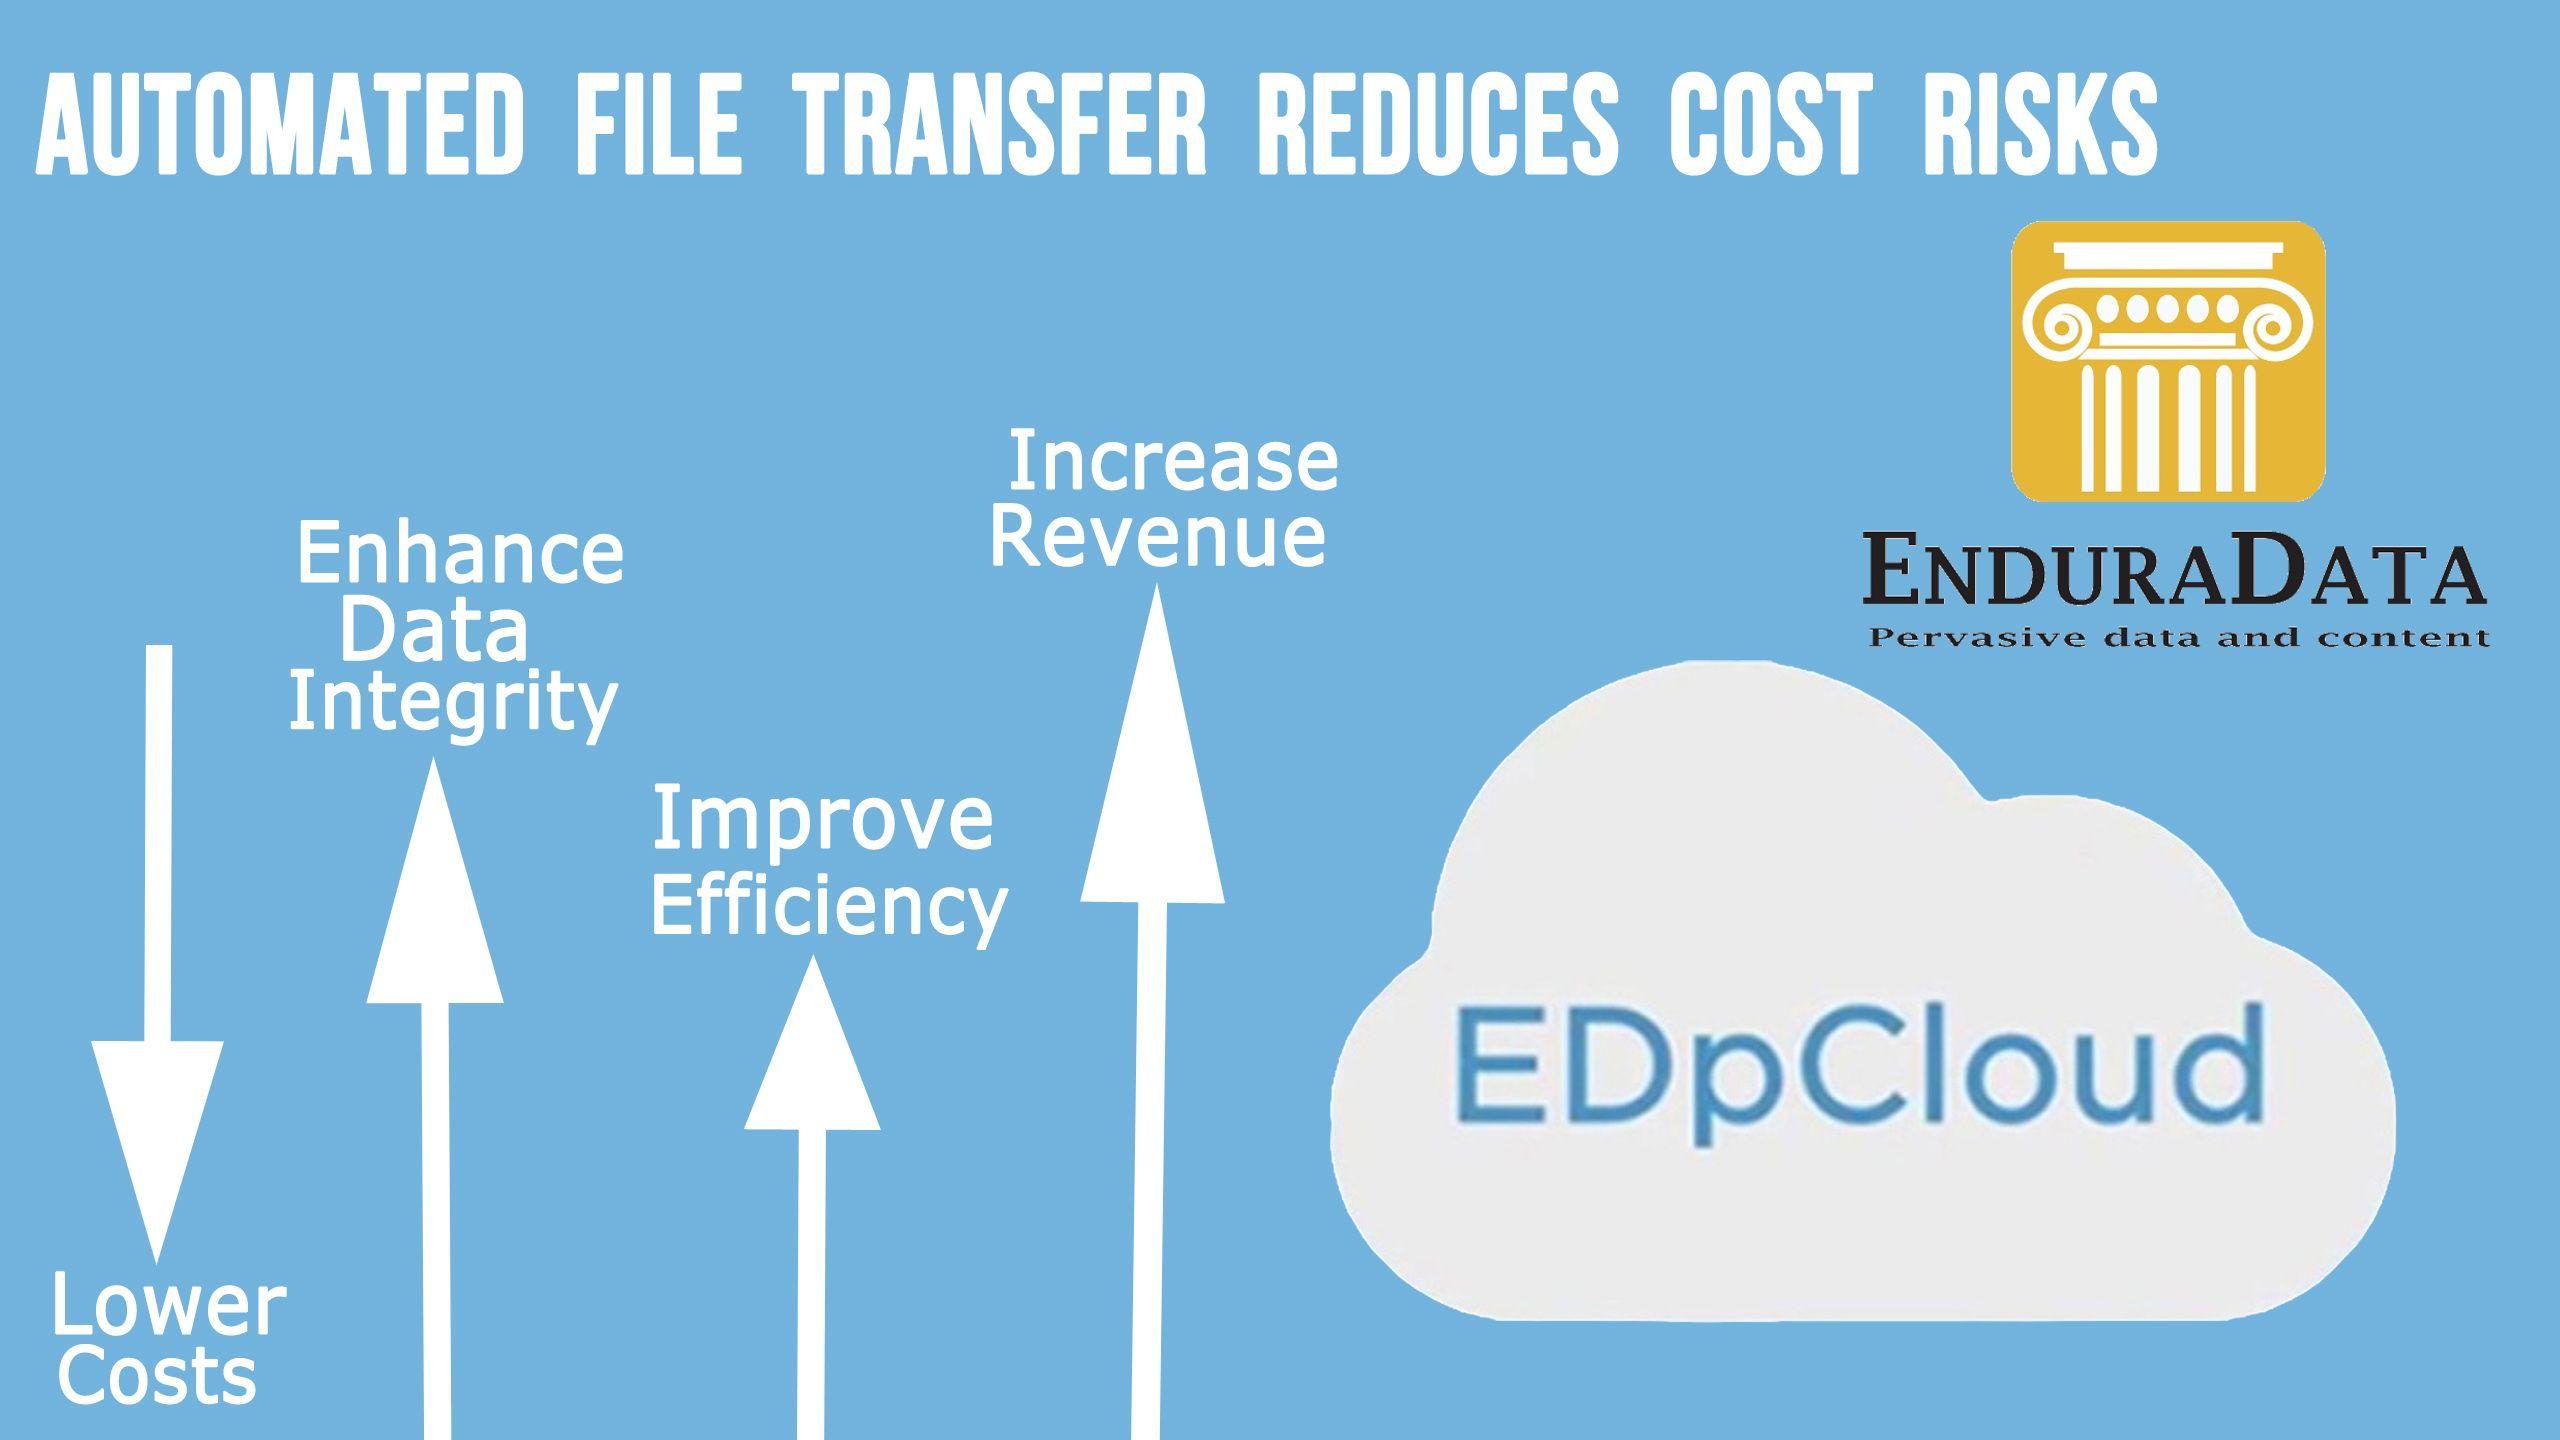 enduradata edpcloud cross platform automated file transfer sends